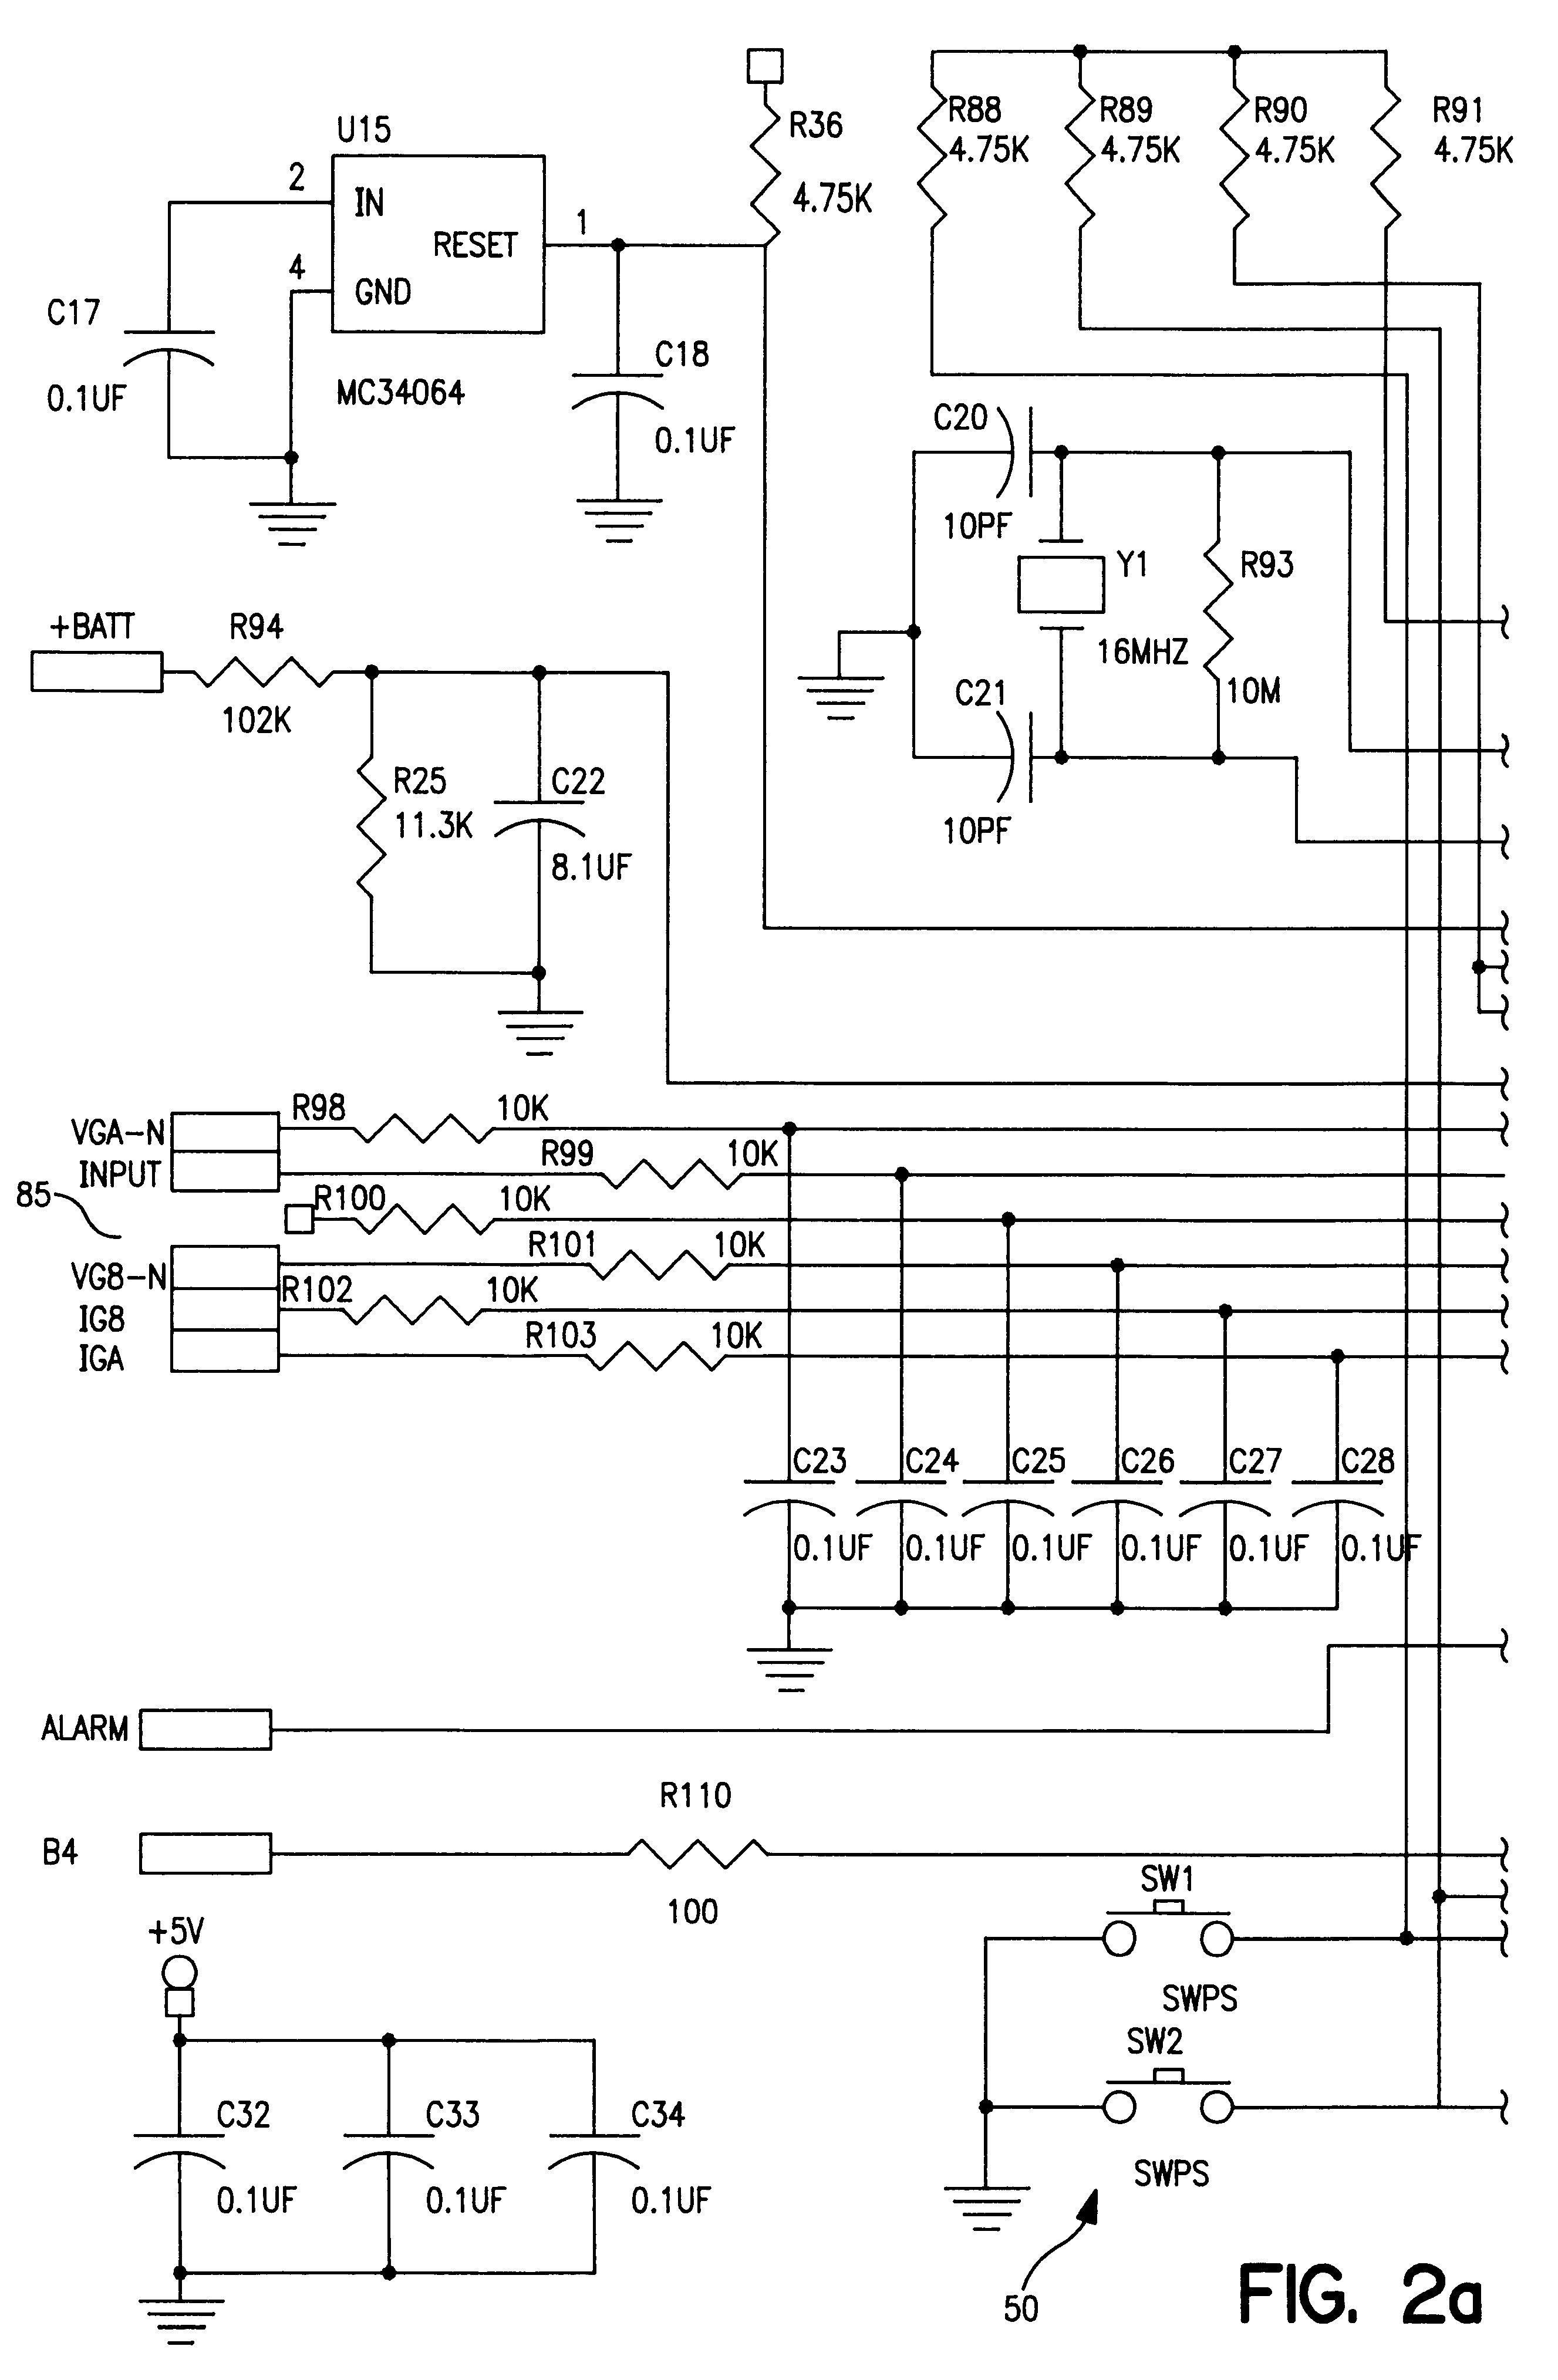 Generator Automatic Transfer Switch Wiring Diagram In 2020 Generator Transfer Switch Transfer Switch Backup Generator